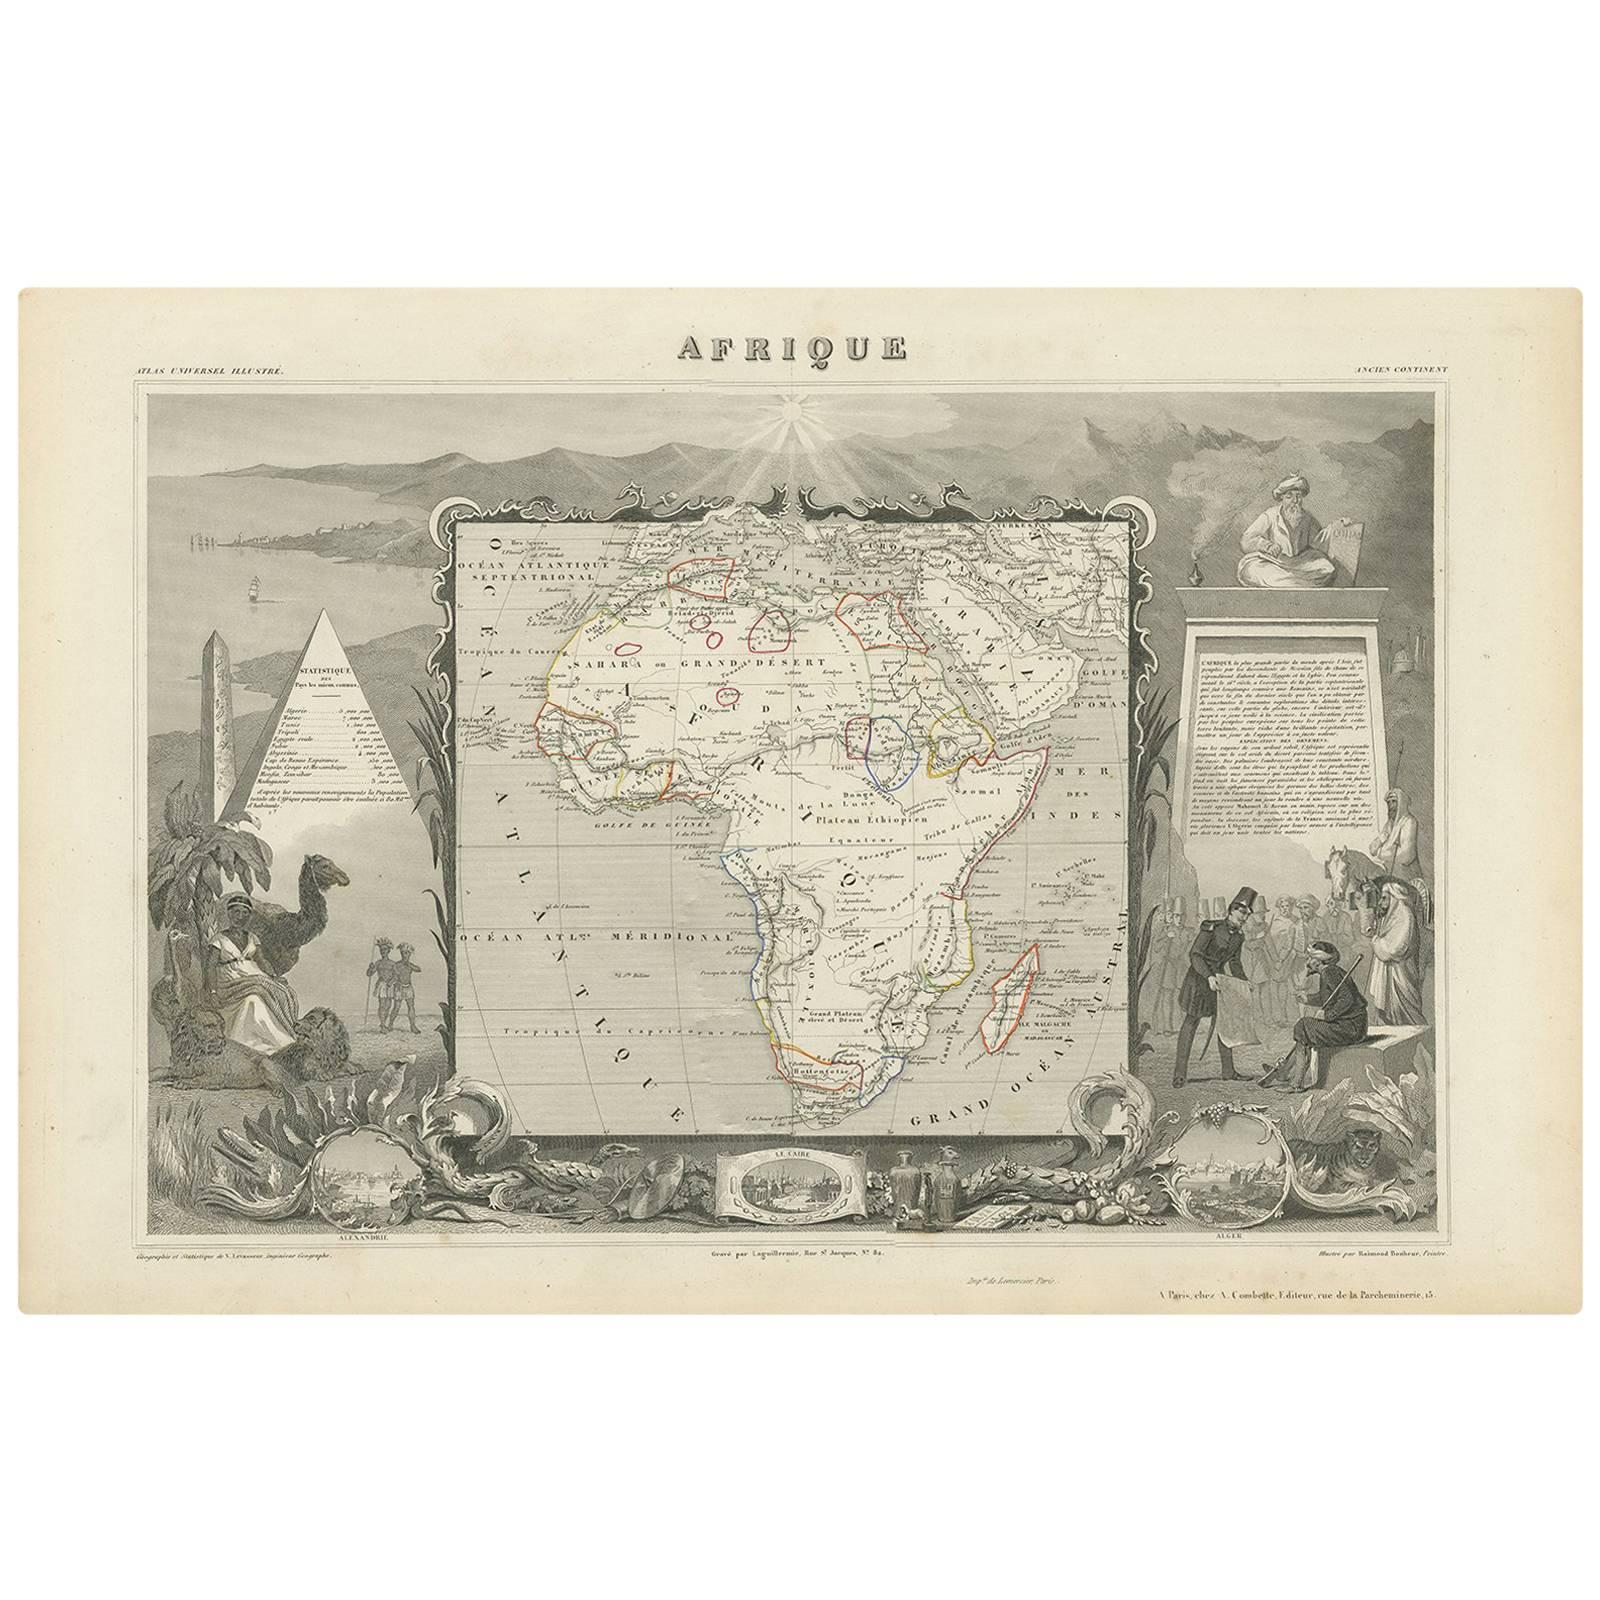 Antique Map of Africa by V. Levasseur, 1854